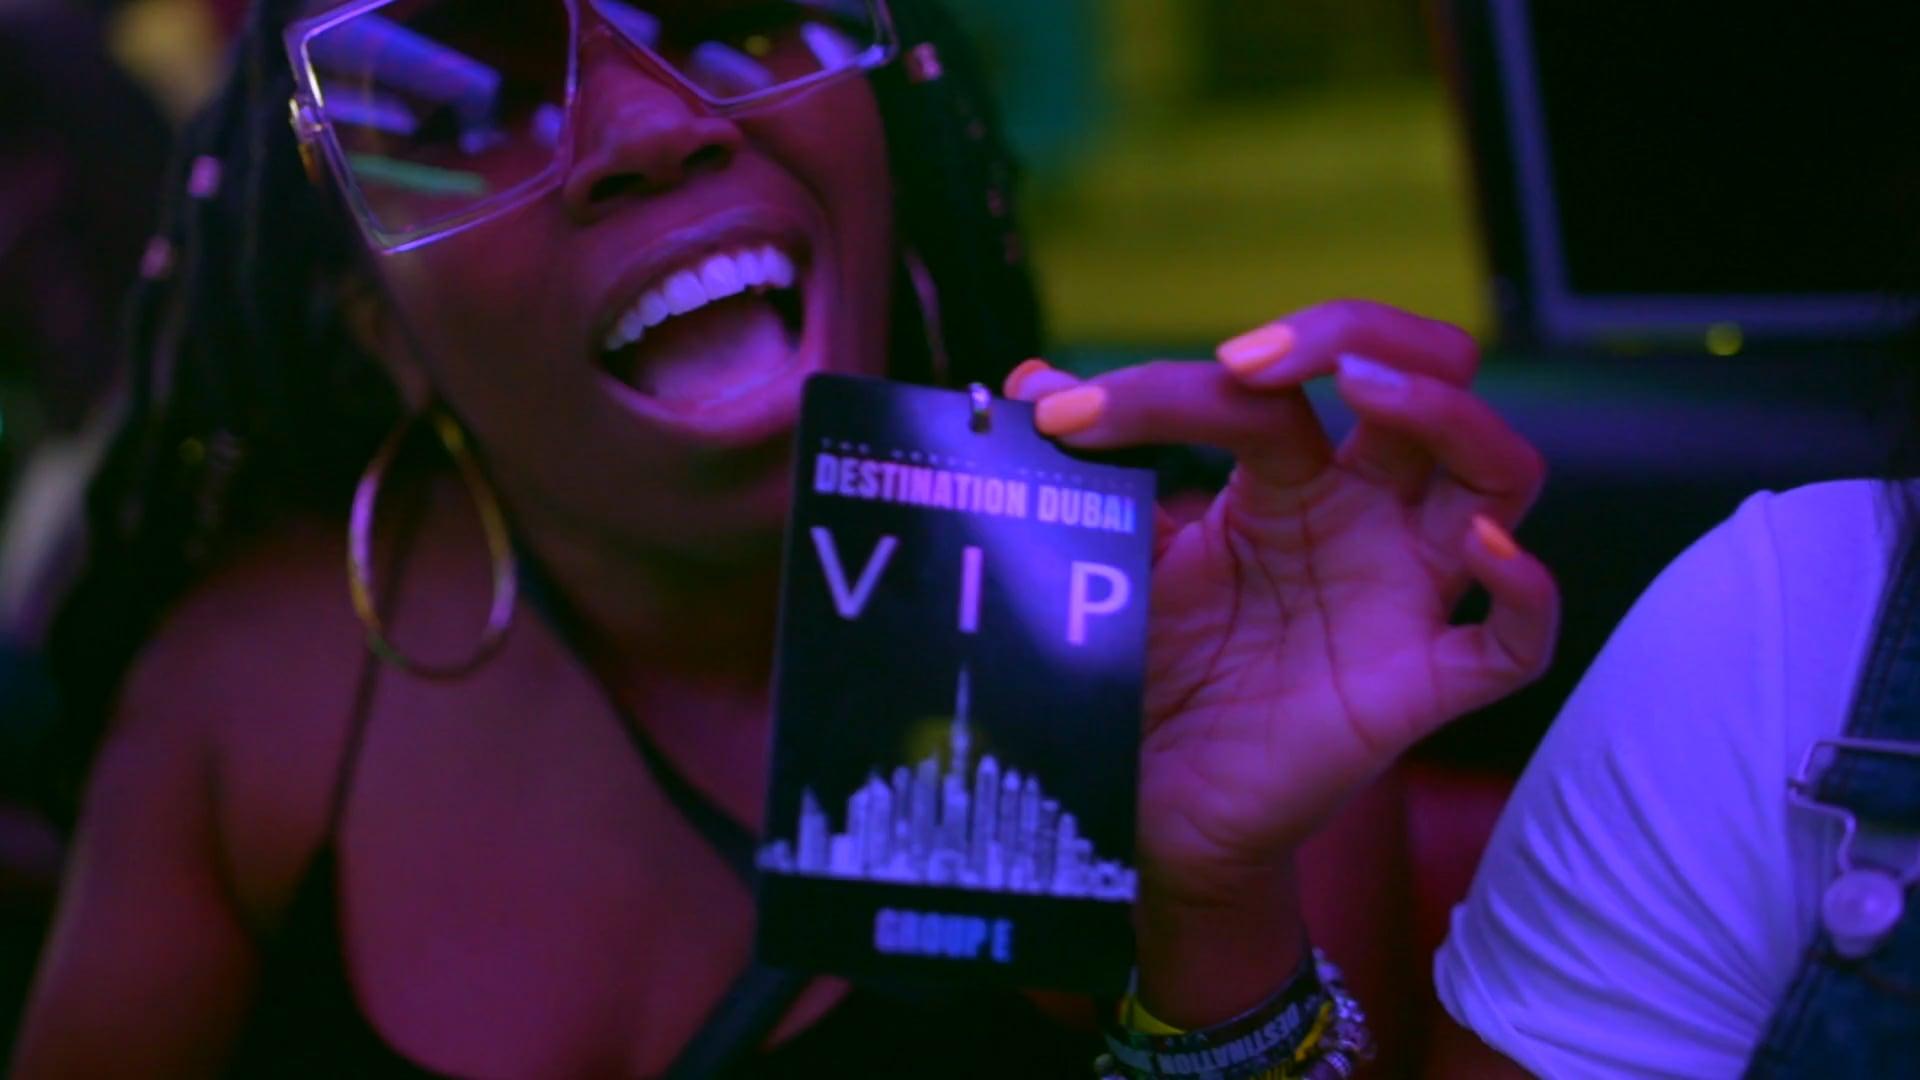 Destination Dubai VIP 2018 - Helicopter Tour : Day Party